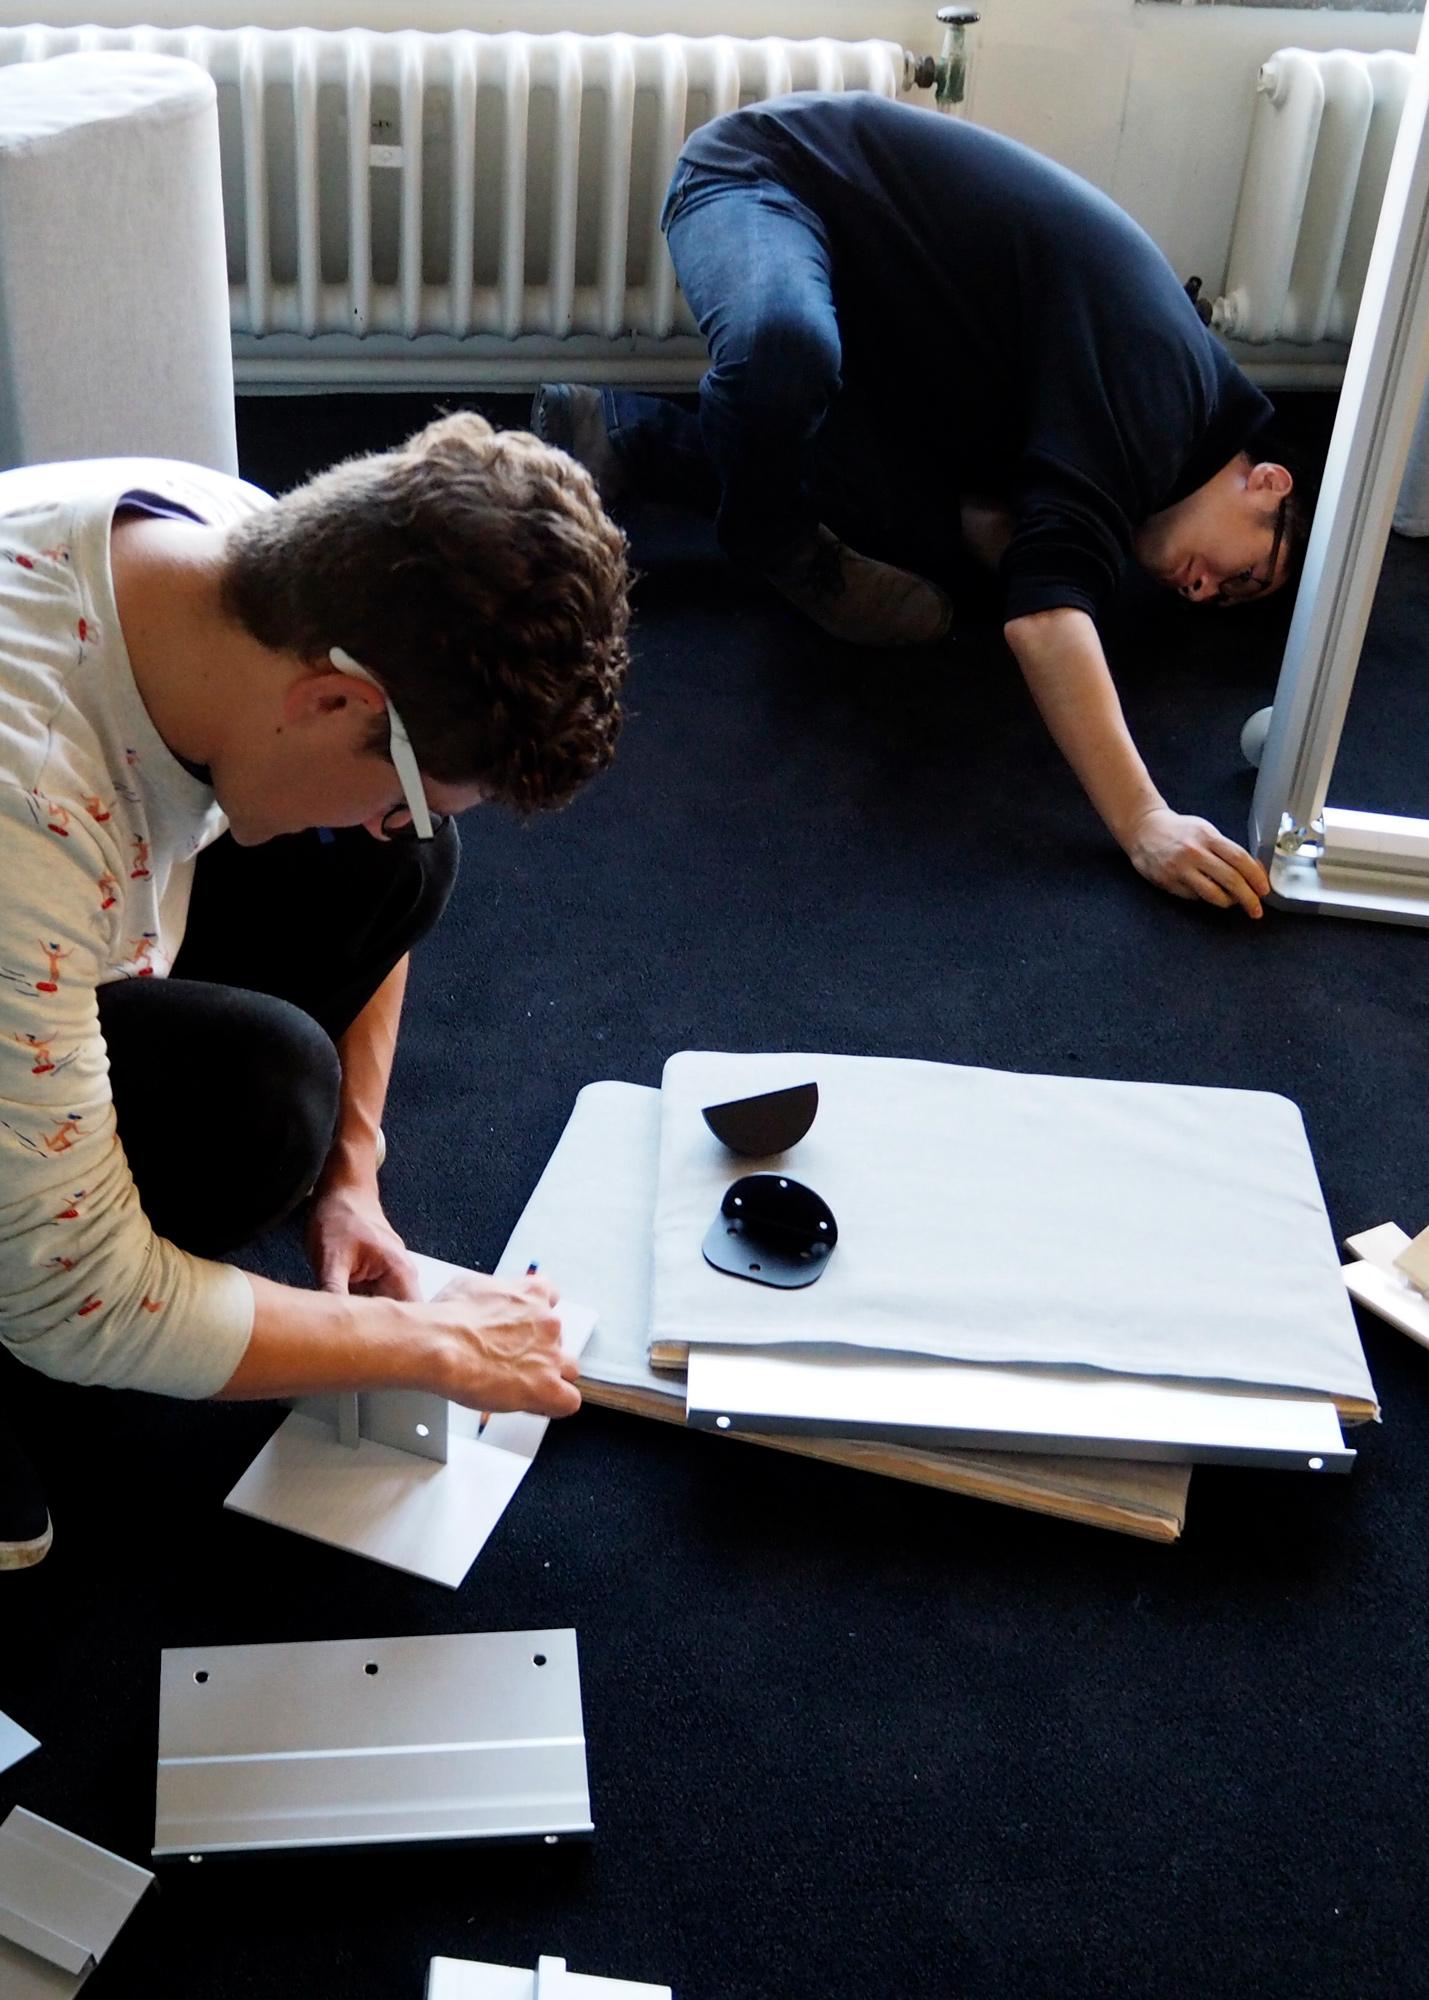 Für Experimente geeignet. (Foto: IKEA Today)